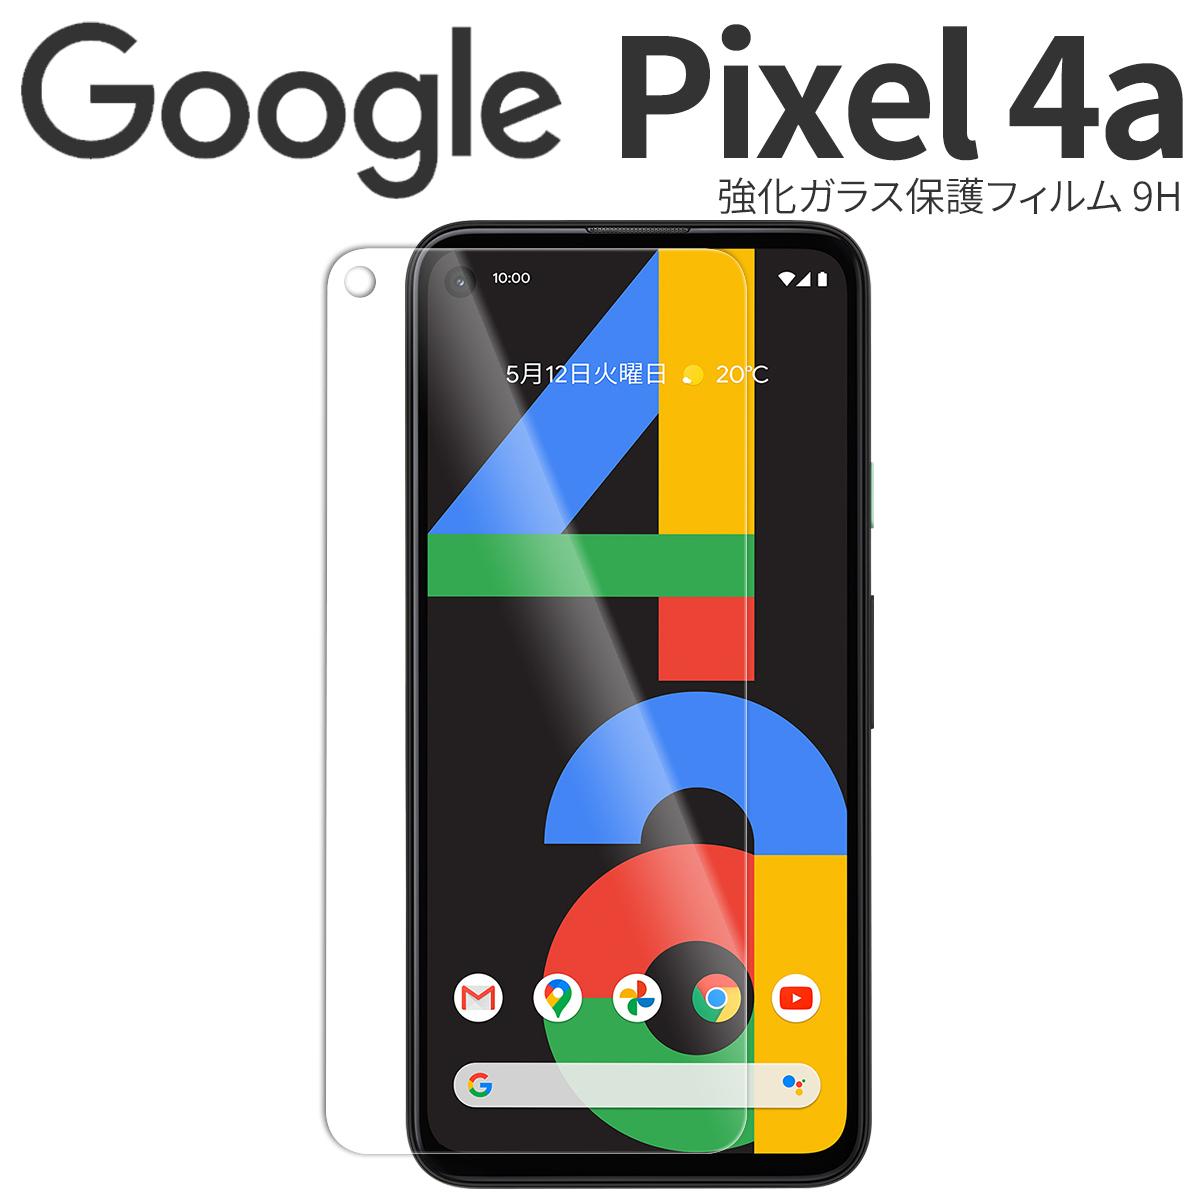 Google Pixel 4a 強化ガラス保護フィルム 9H